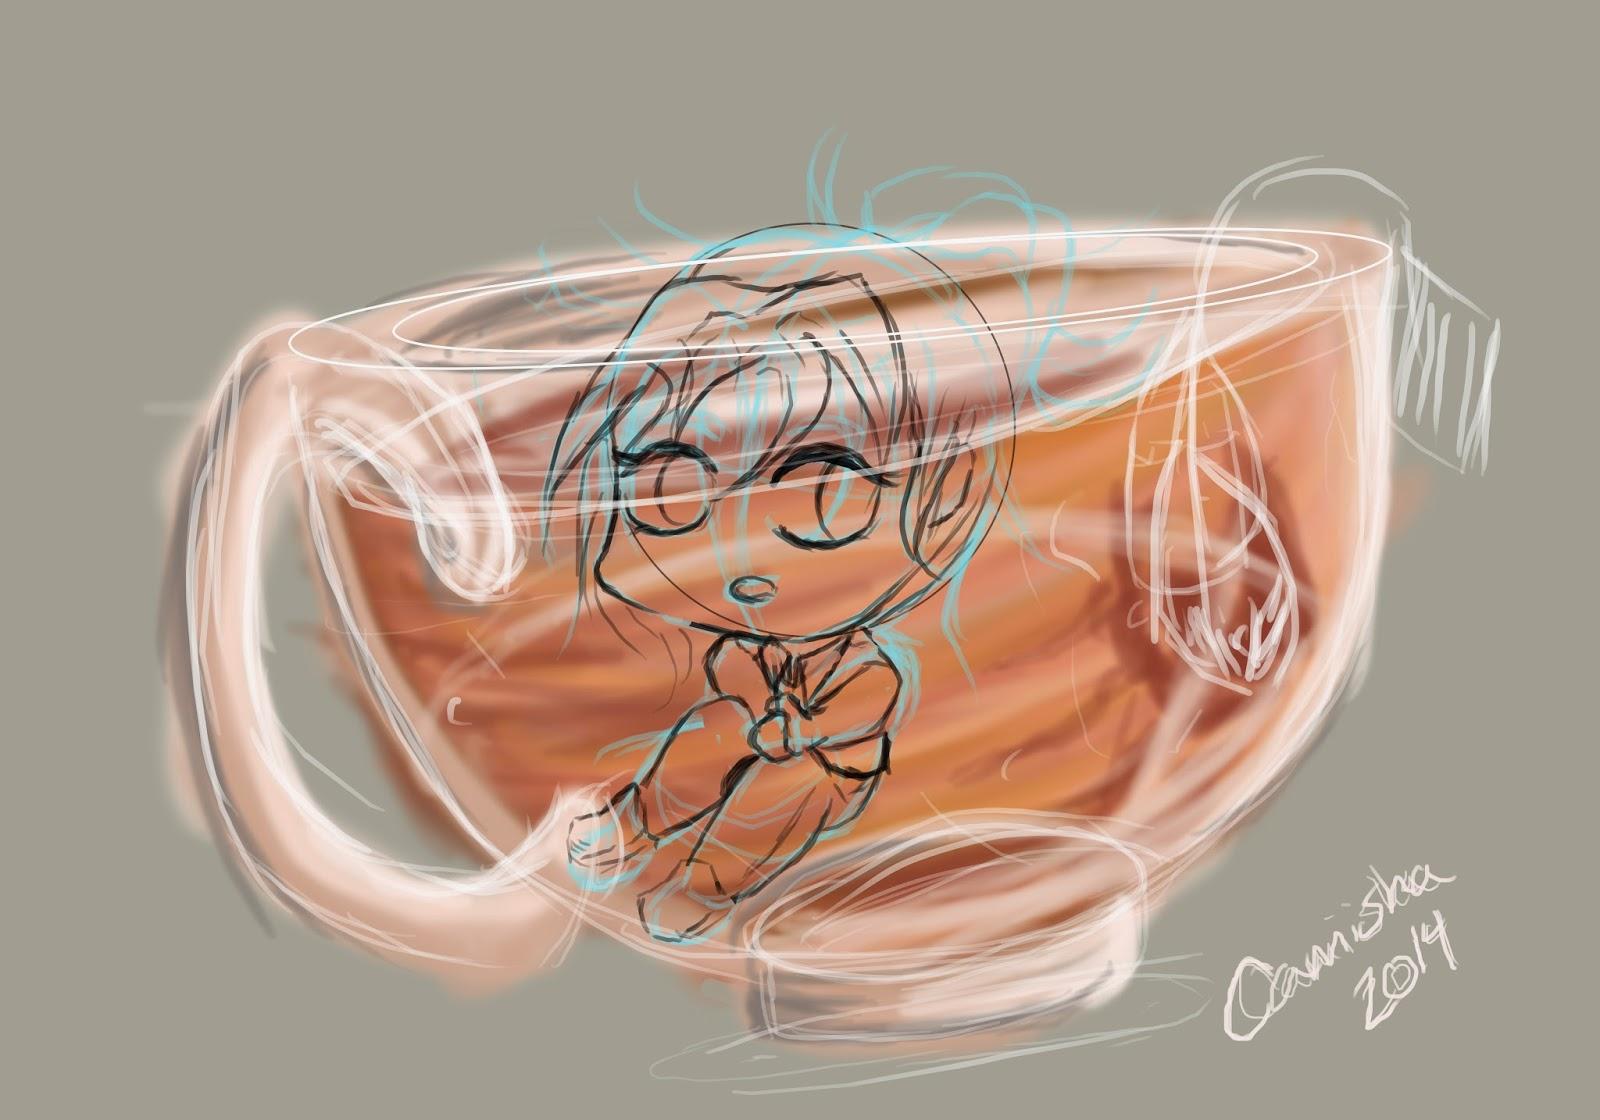 30 minute sketch